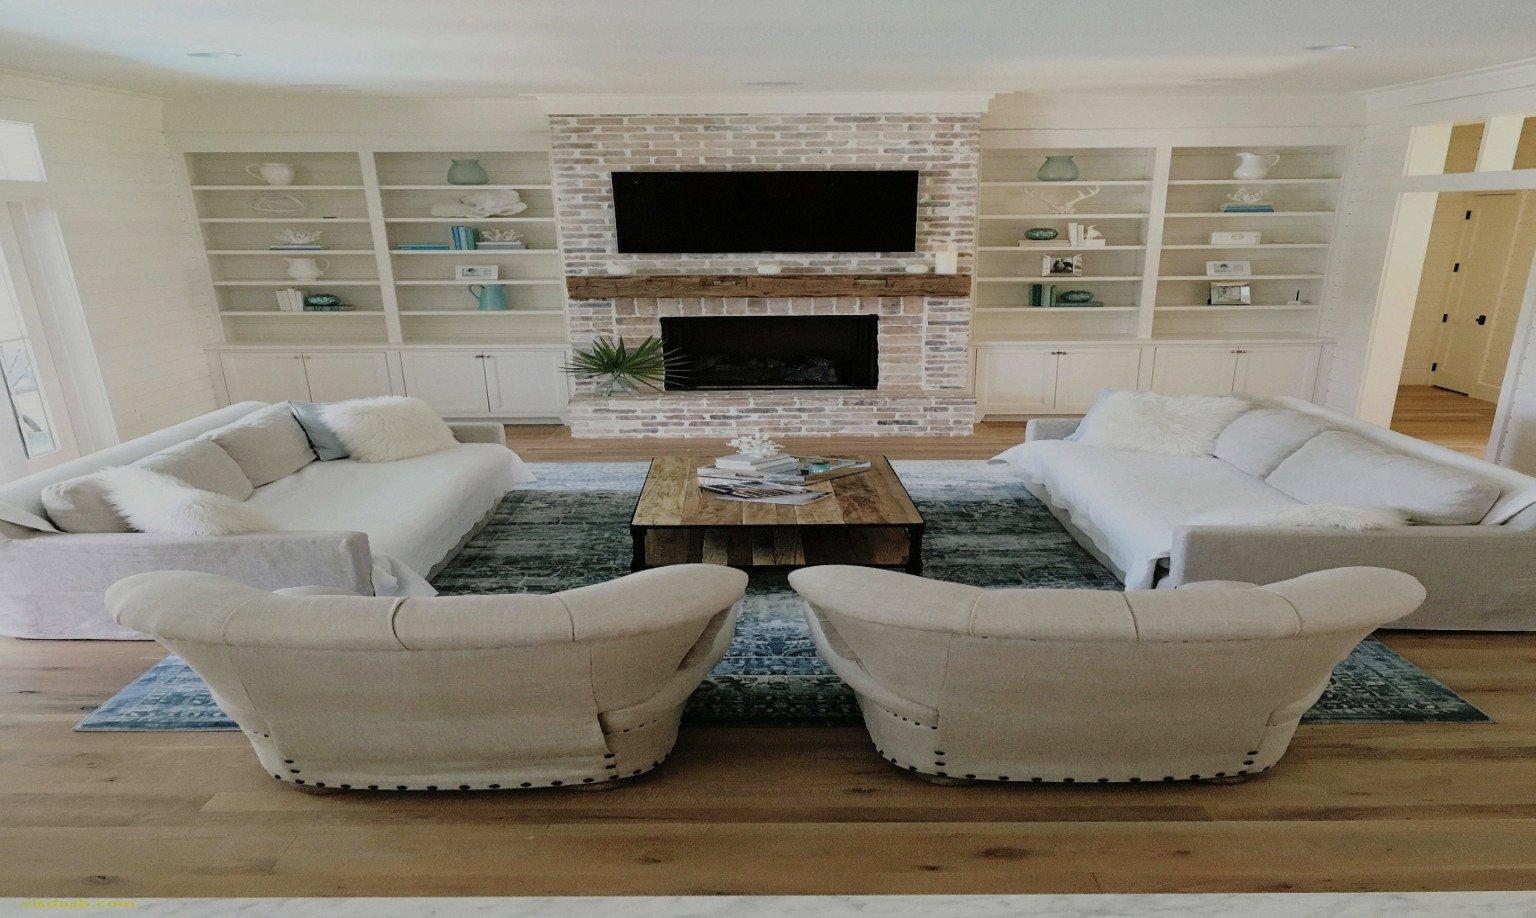 Bedroom Sitting area Ideas Elegant 14 Perfect Hardwood Floor and Wall Color Binations